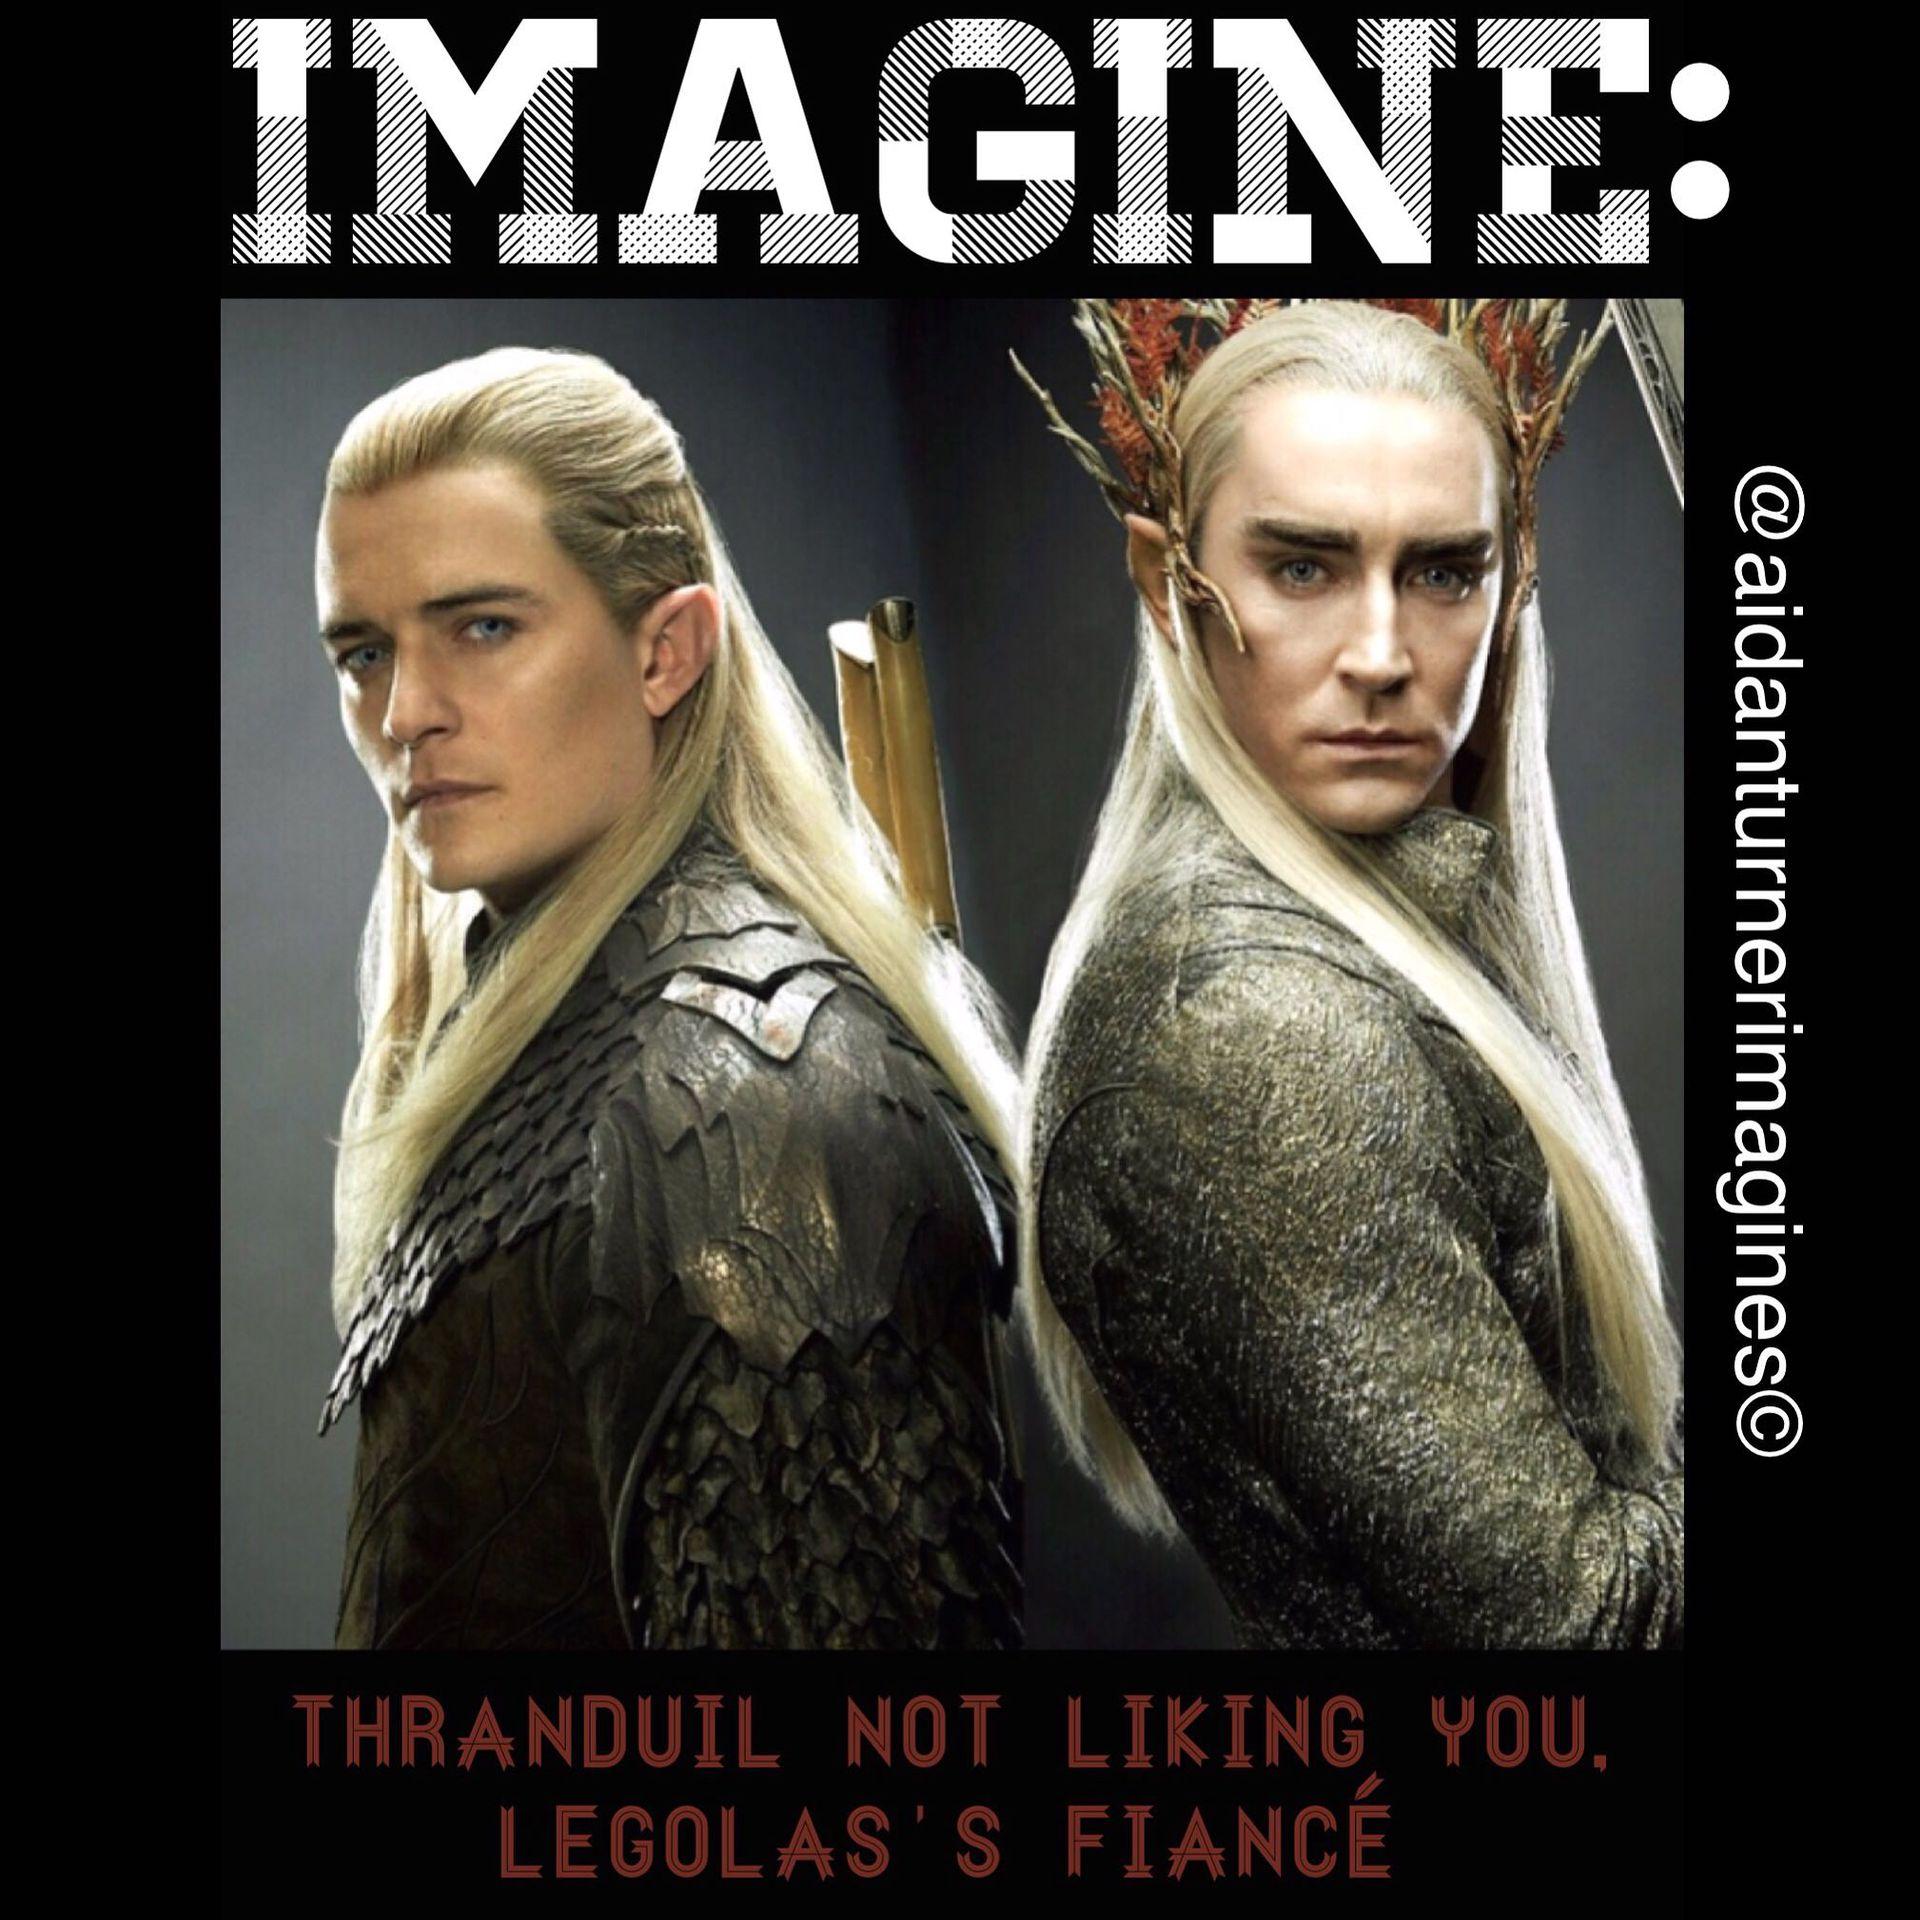 Lee Pace Imagines - IMAGINE: Thranduil not liking you, Legolas's